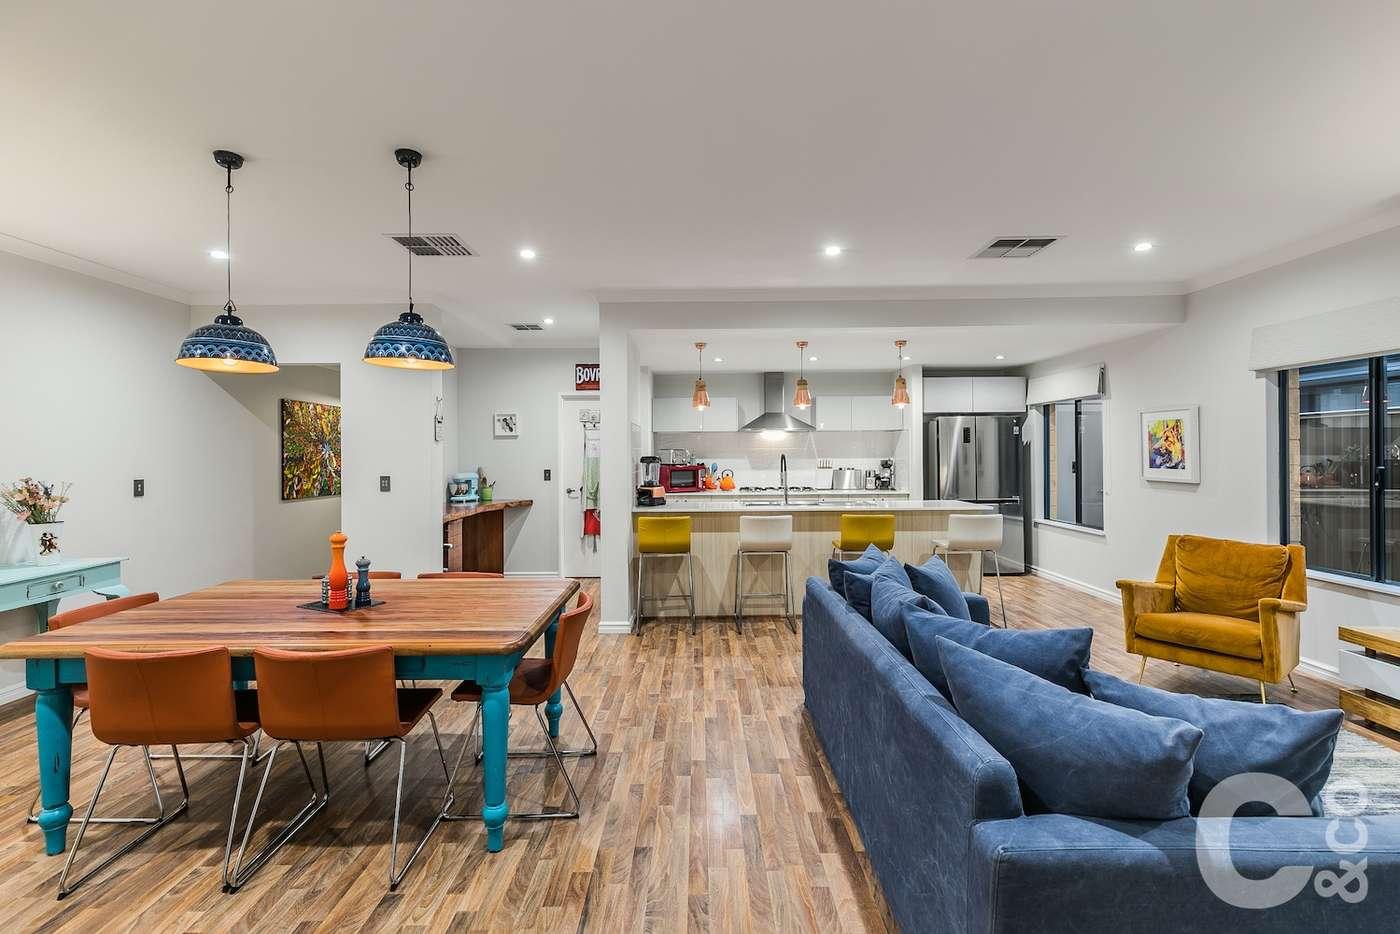 Fifth view of Homely house listing, 23 Ipswich Street, Wellard WA 6170